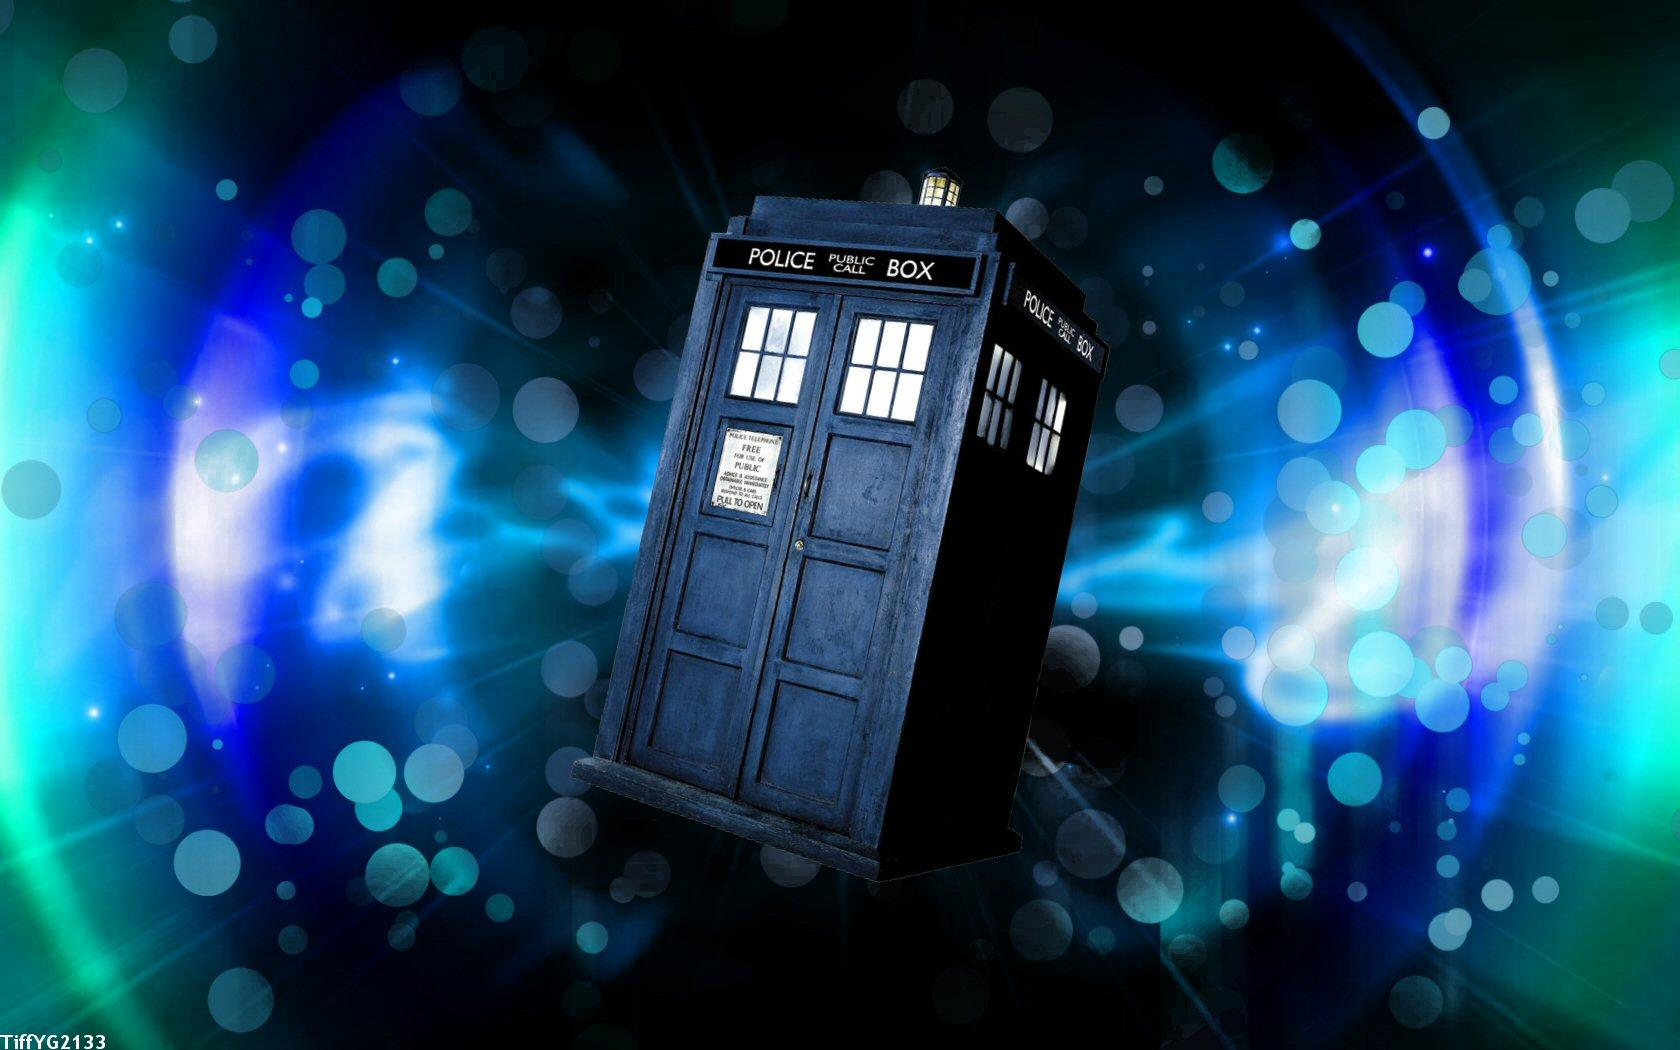 TARDIS Doctor Wallpaper 1680x1050 TARDIS Doctor Who 1680x1050